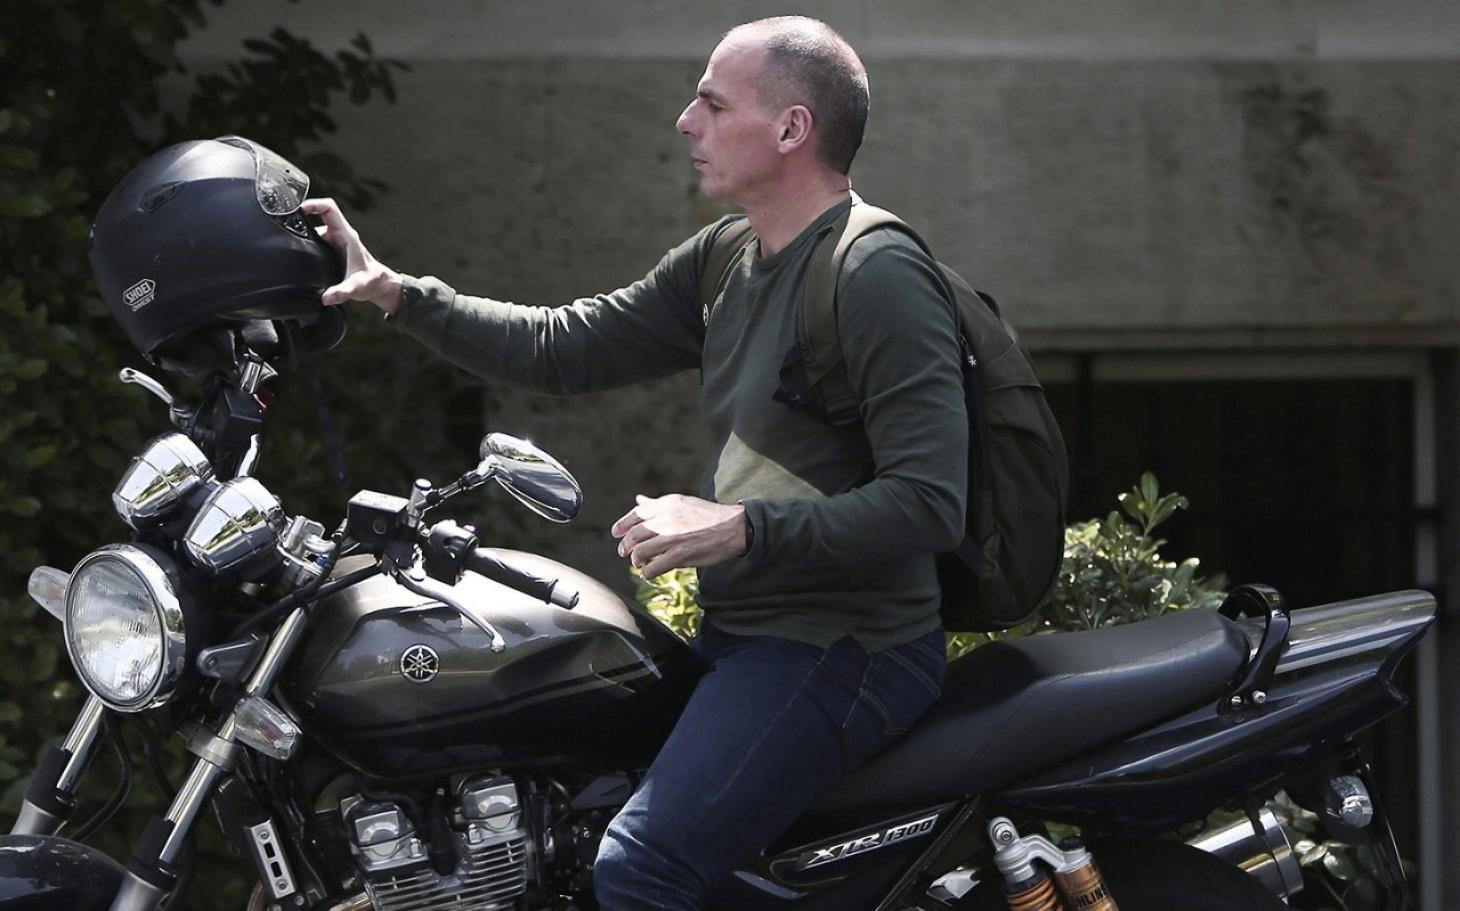 Yanis Varoufakis Is More Than His Clothes Al Jazeera America